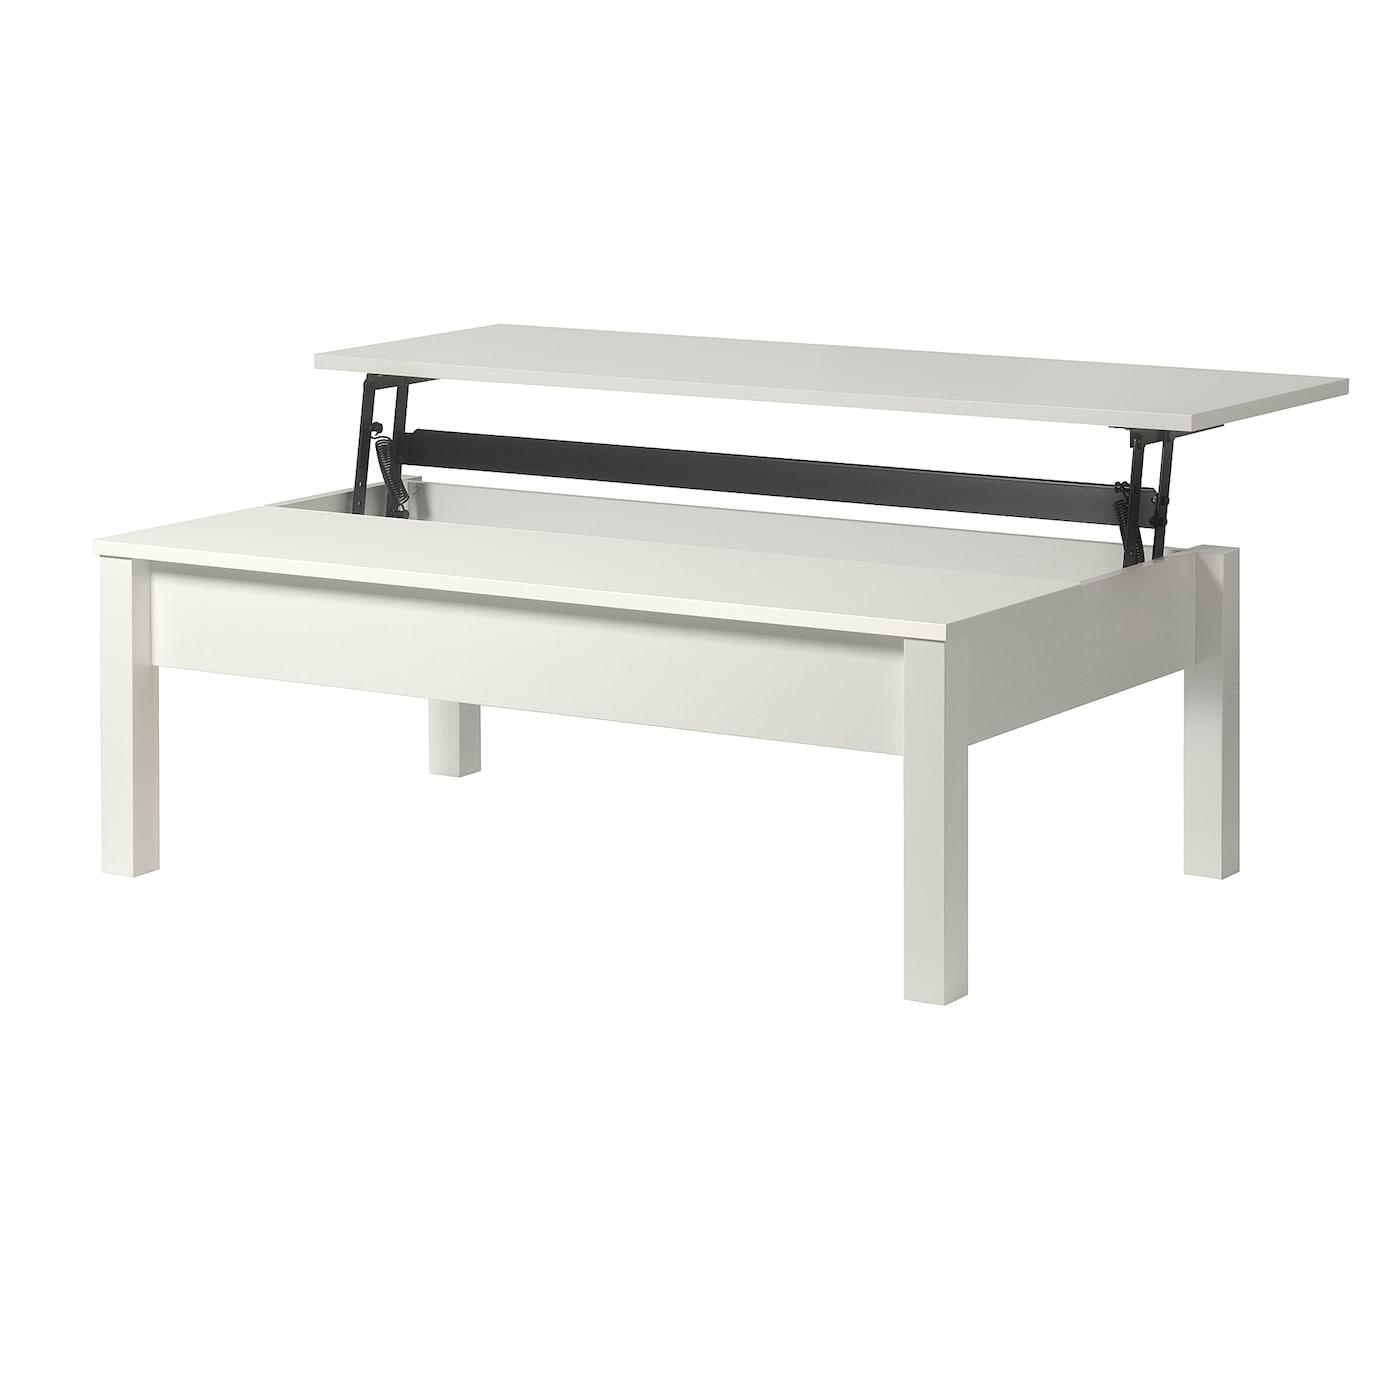 Trulstorp Coffee Table White 115x70 Cm Ikea [ 1399 x 1400 Pixel ]